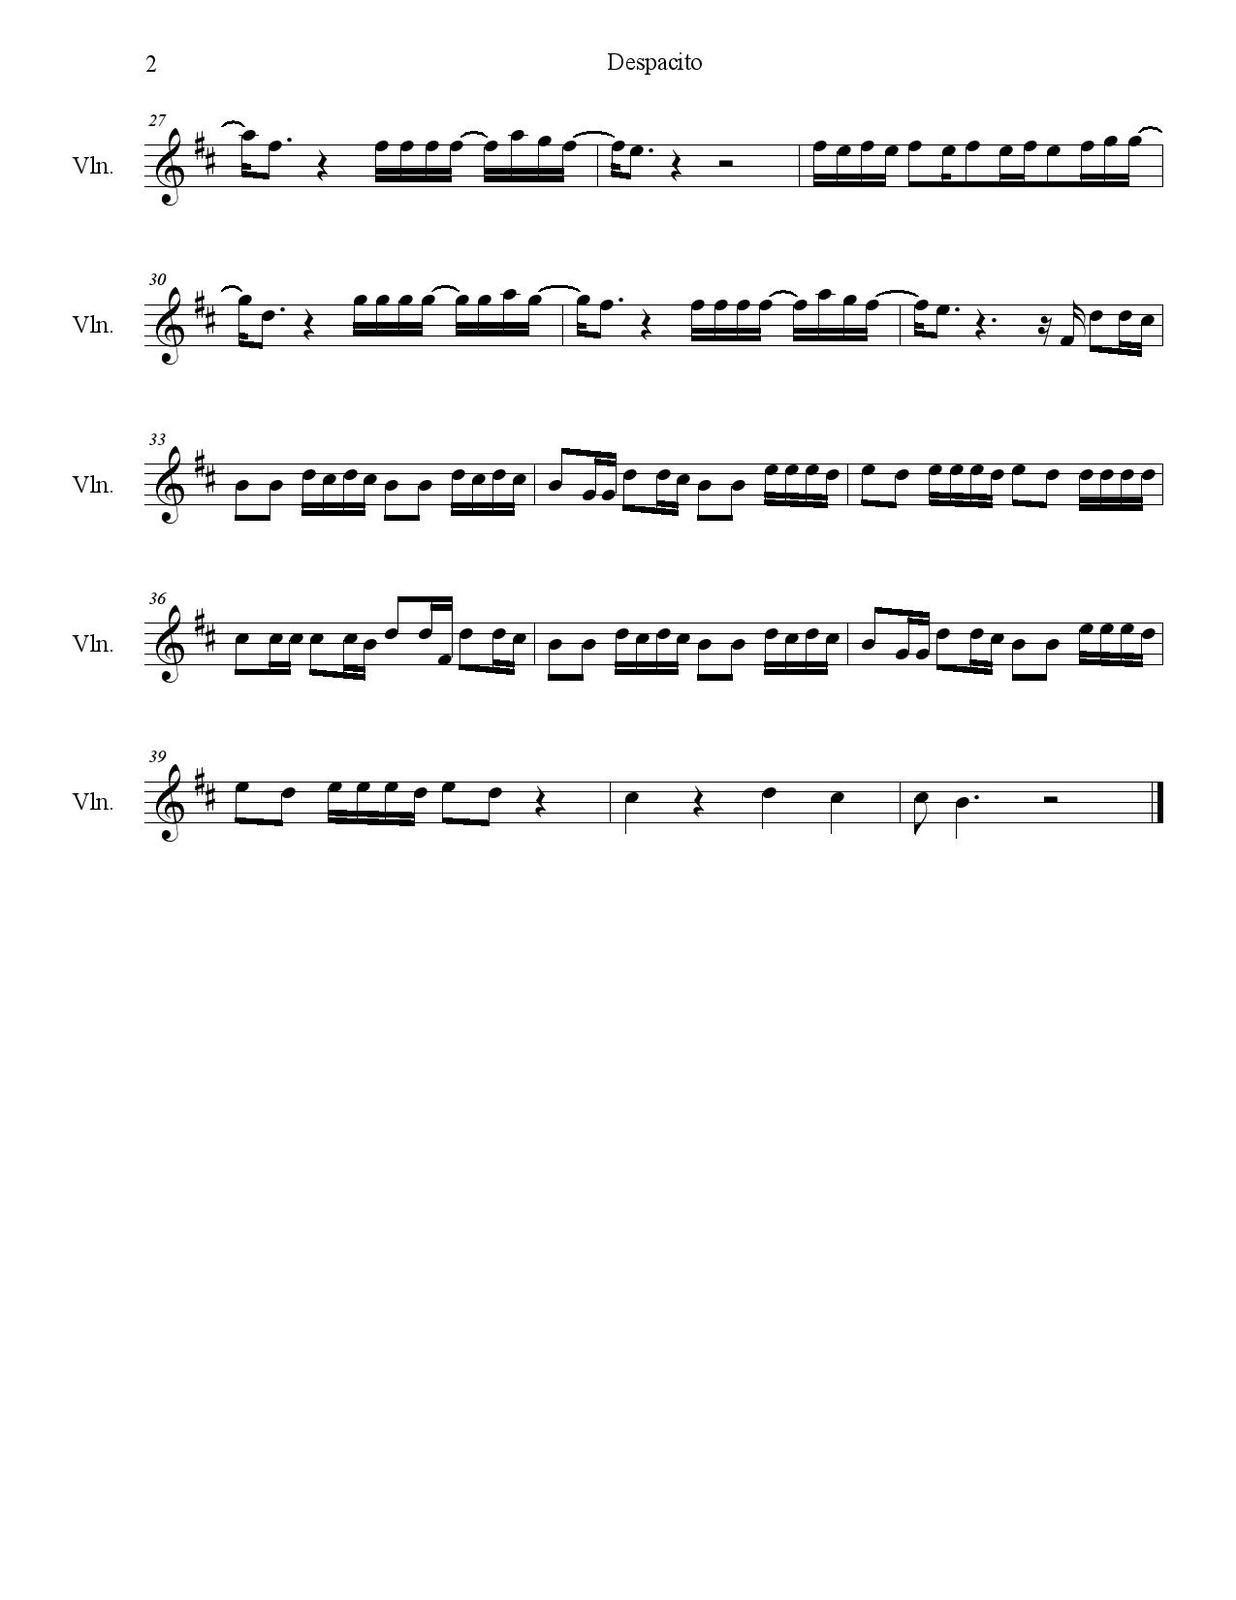 Partitura De La Cancion Despacito Violin Music Piano Music